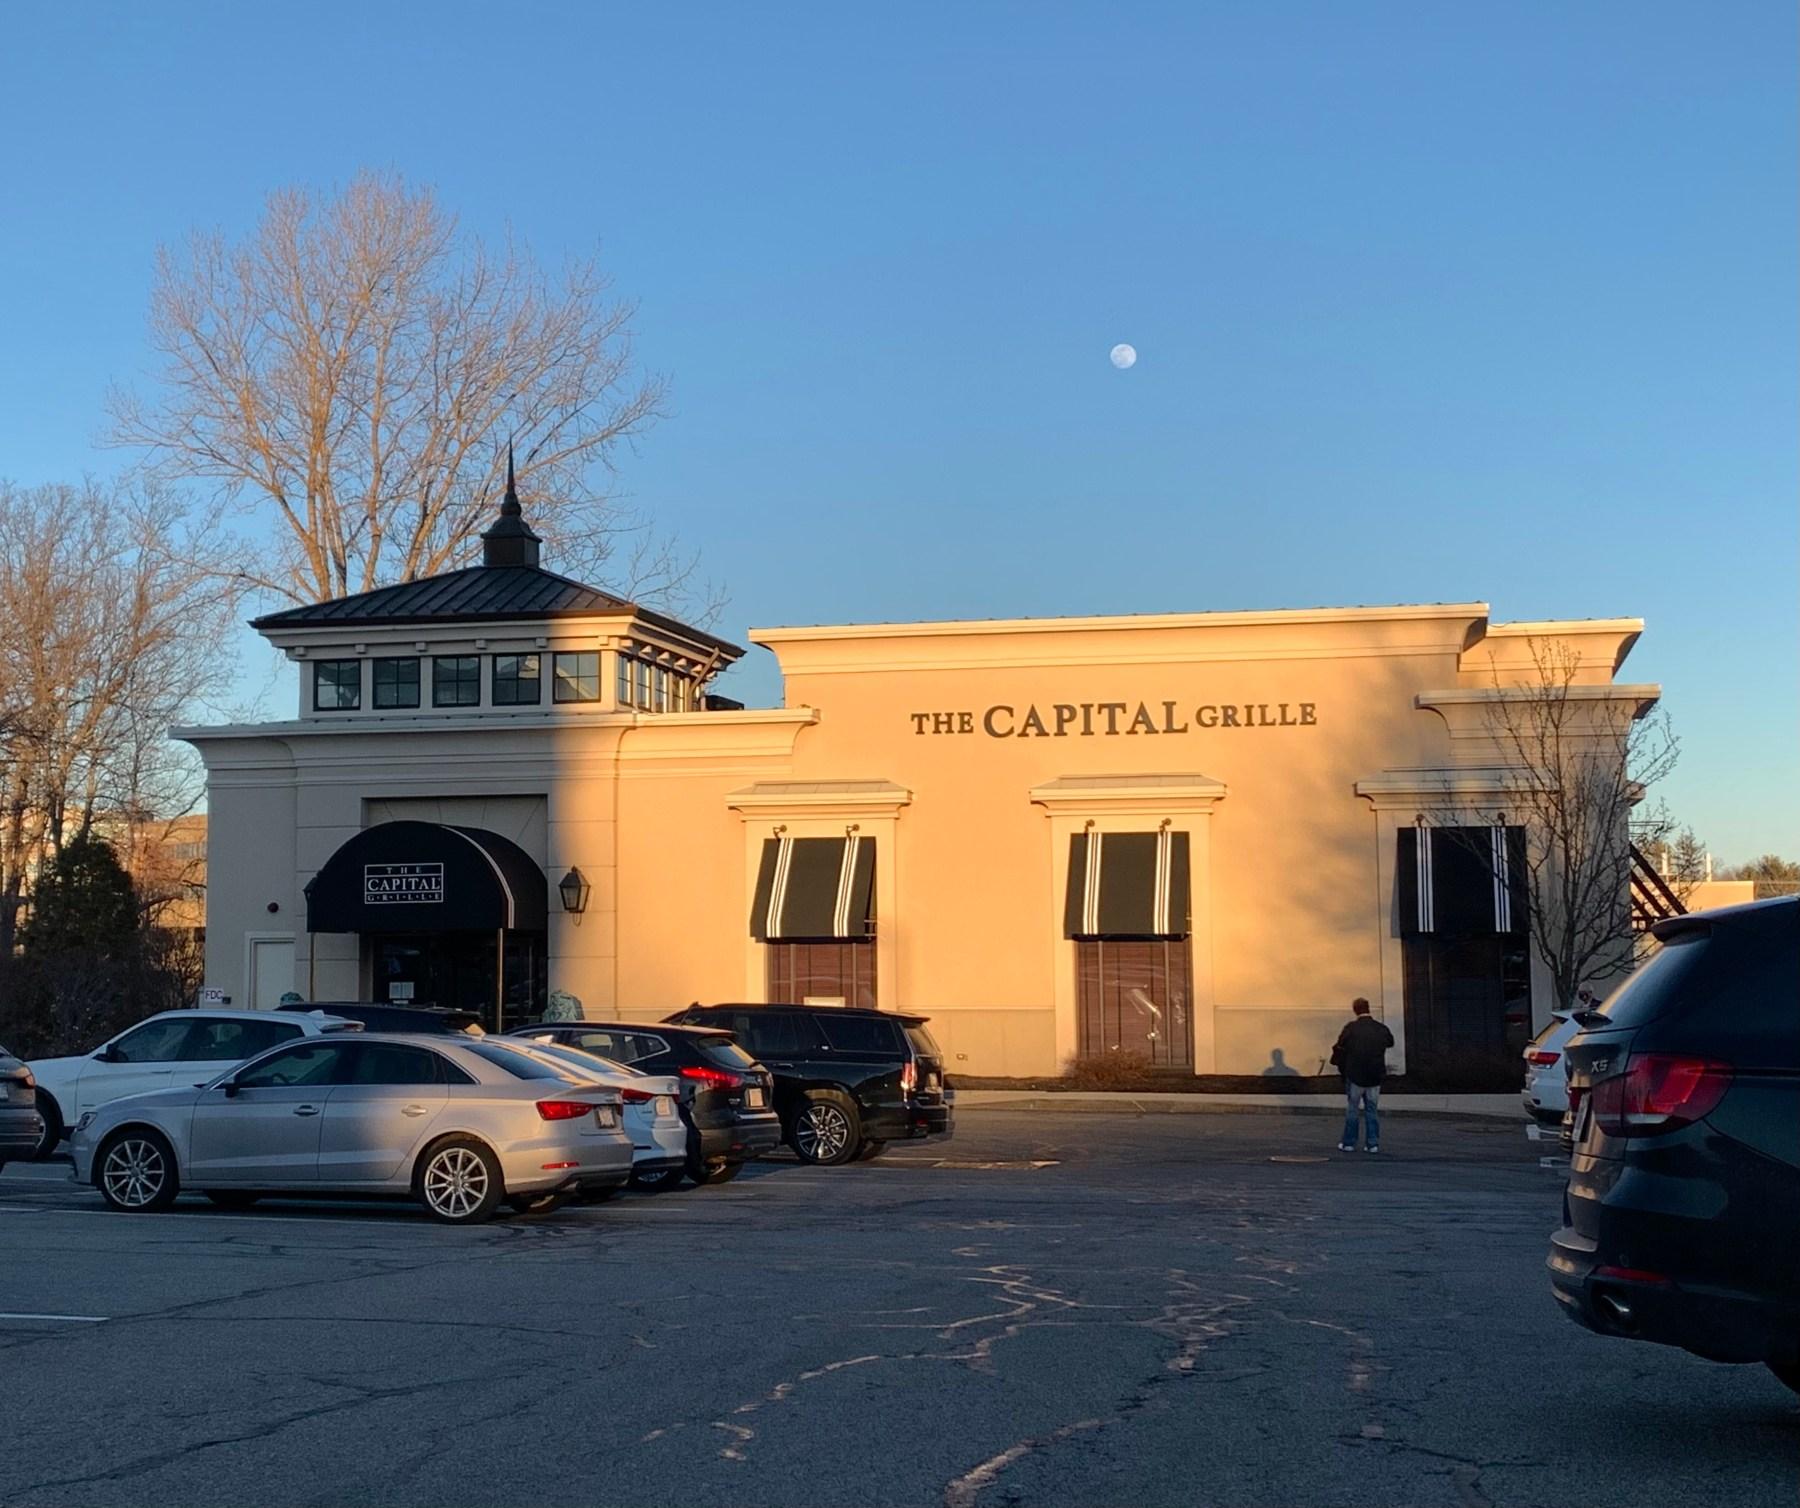 Capital Grille and moon, 10 Wayside Road, Burlington MA